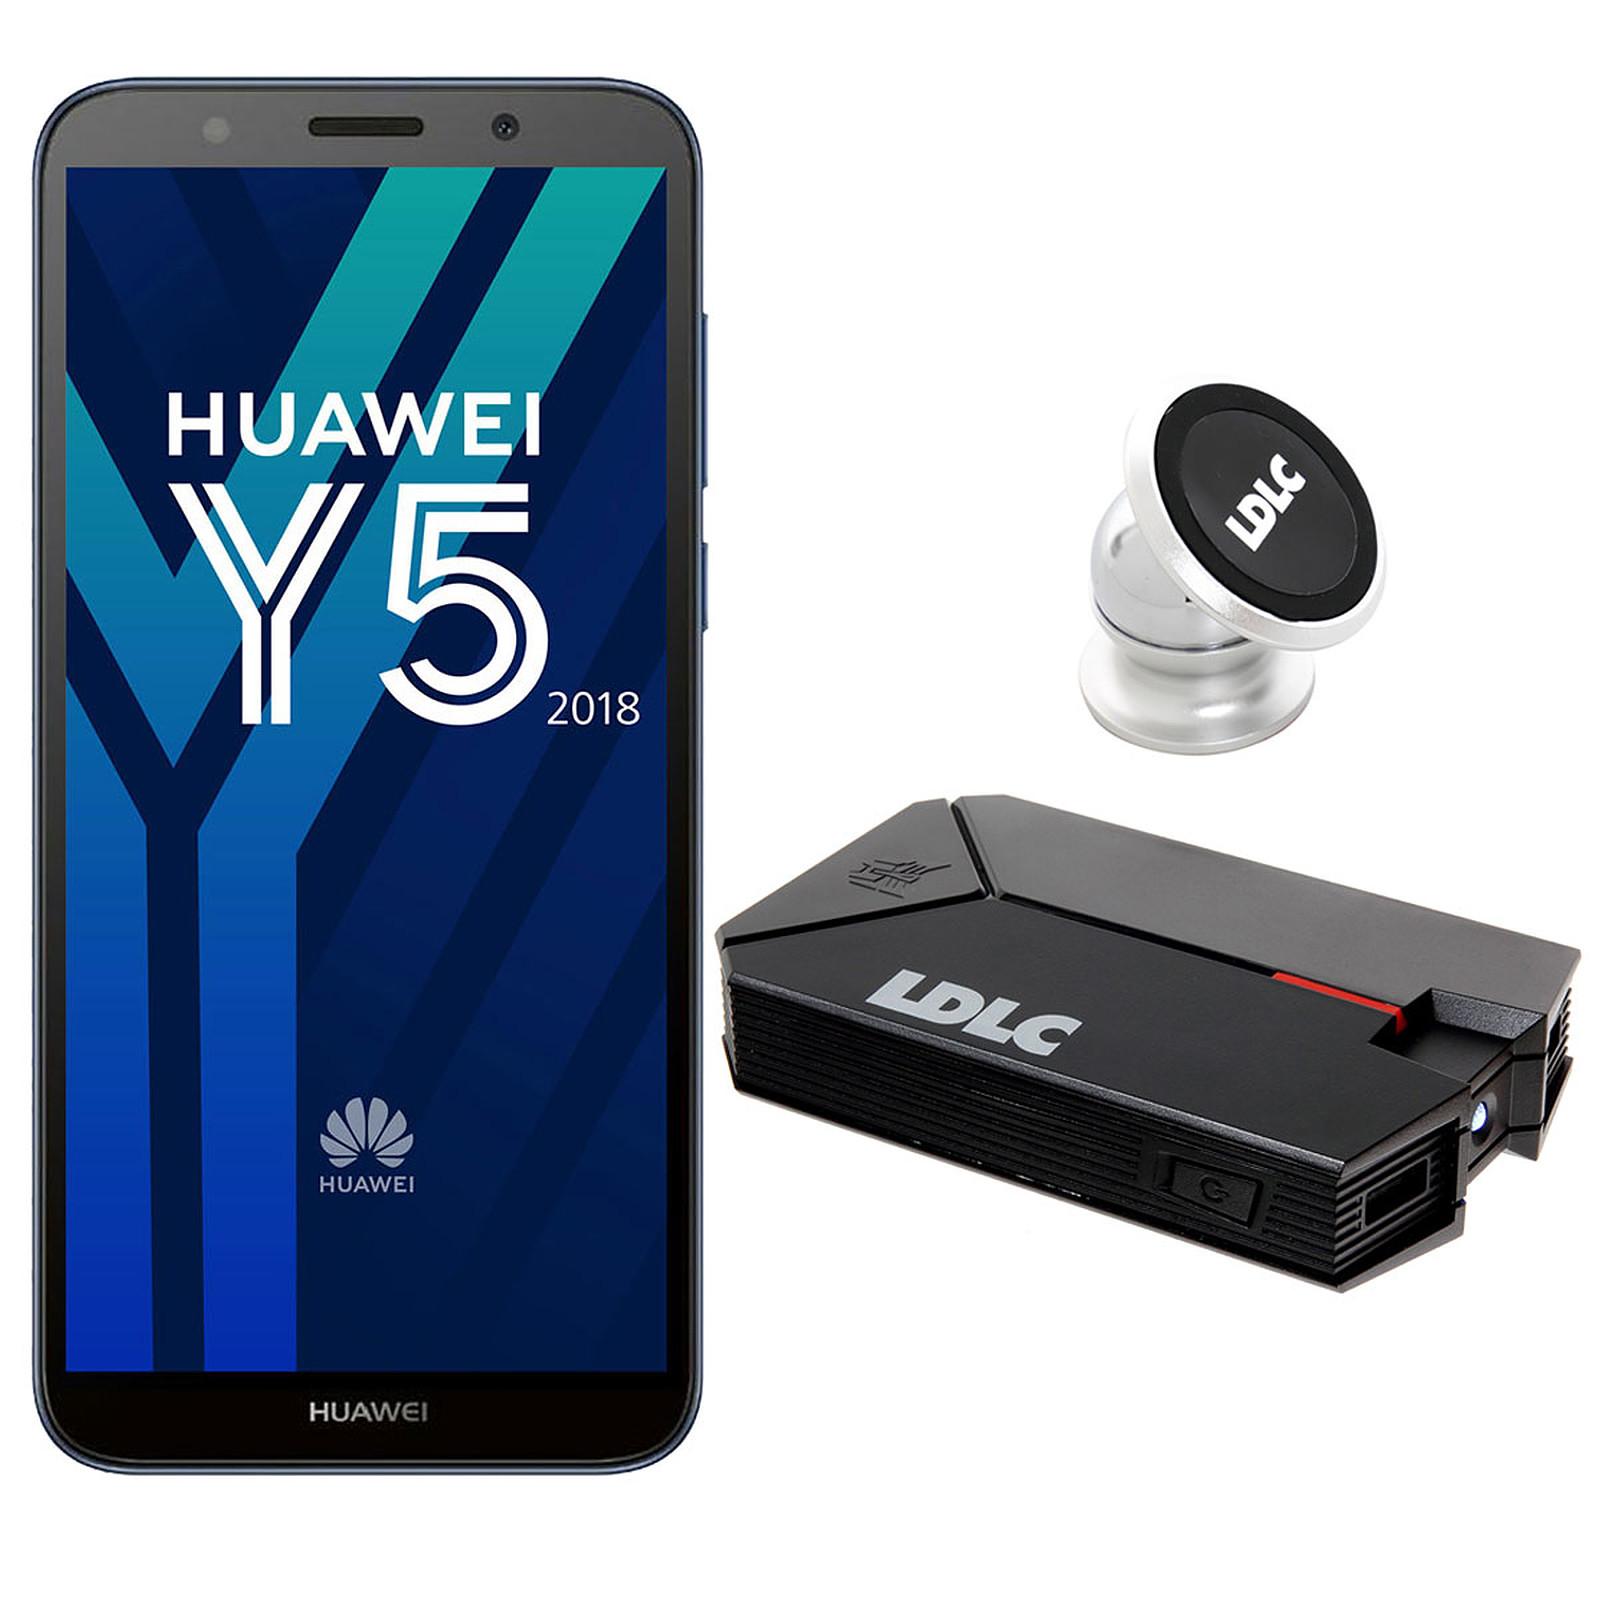 Huawei Y5 2018 Bleu + LDLC Power Bank QS10K + Auto S1